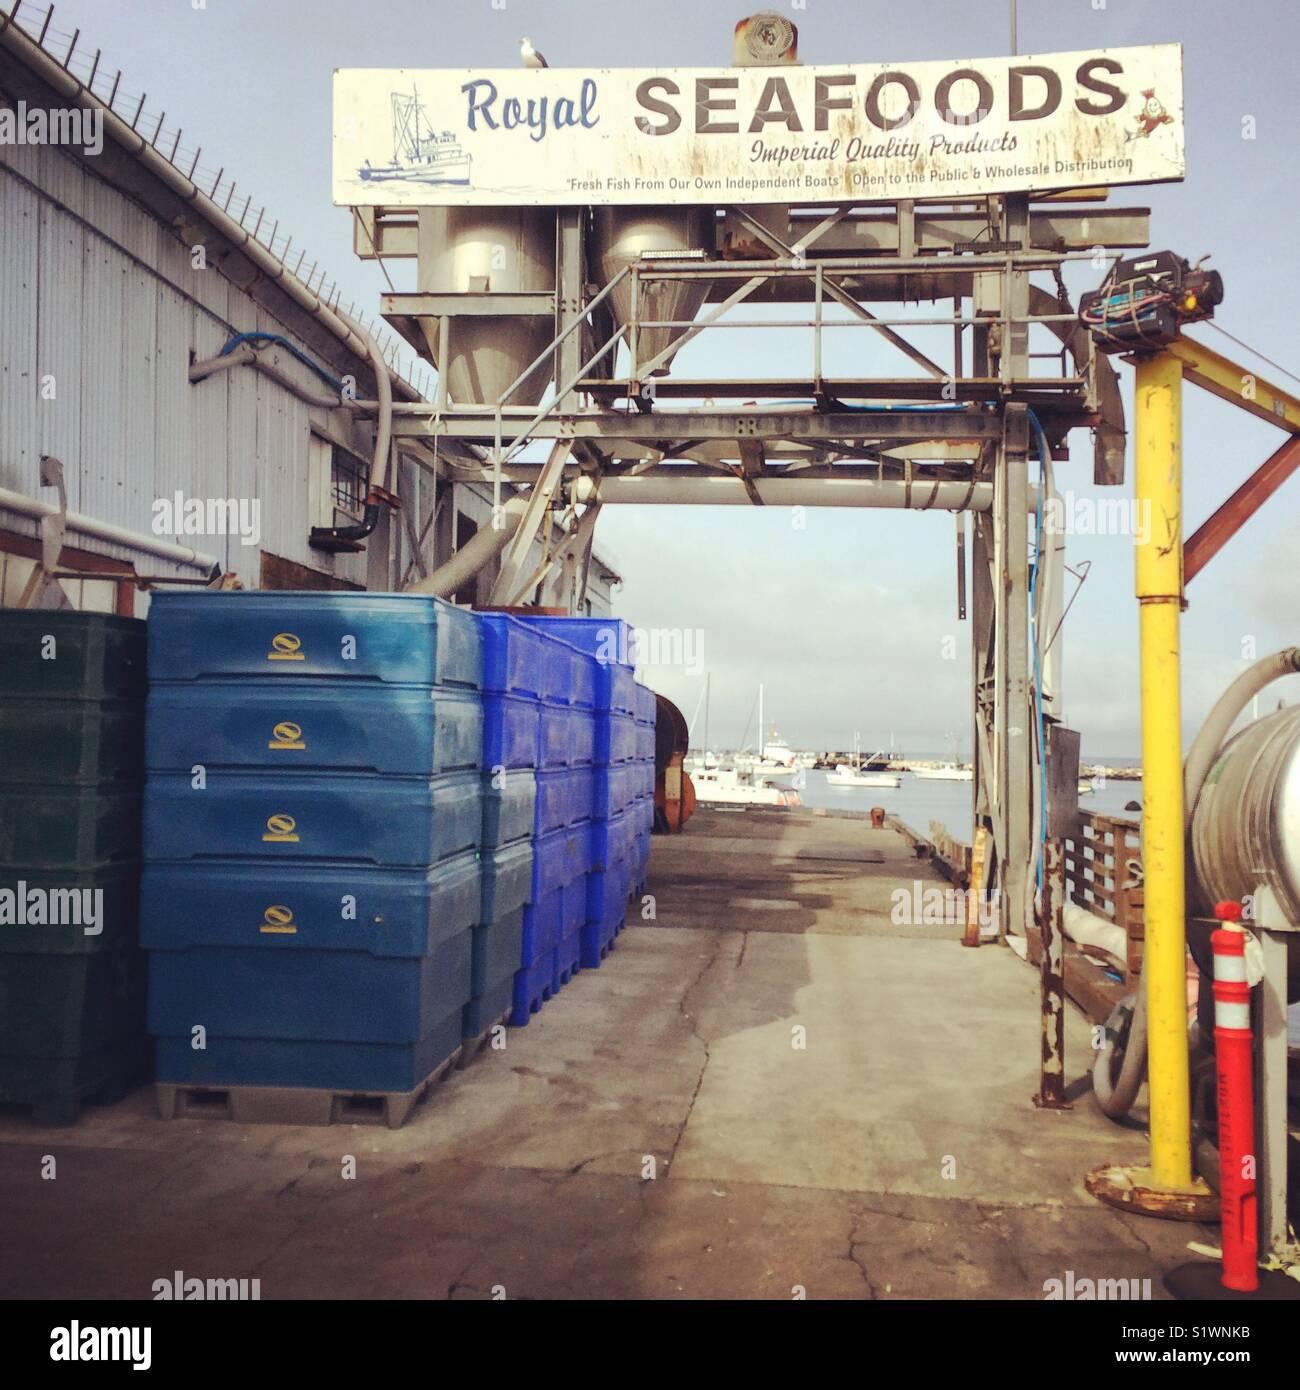 Royal Seafoods, Monterey Municipal Wharf 2, Monterey, California - Stock Image